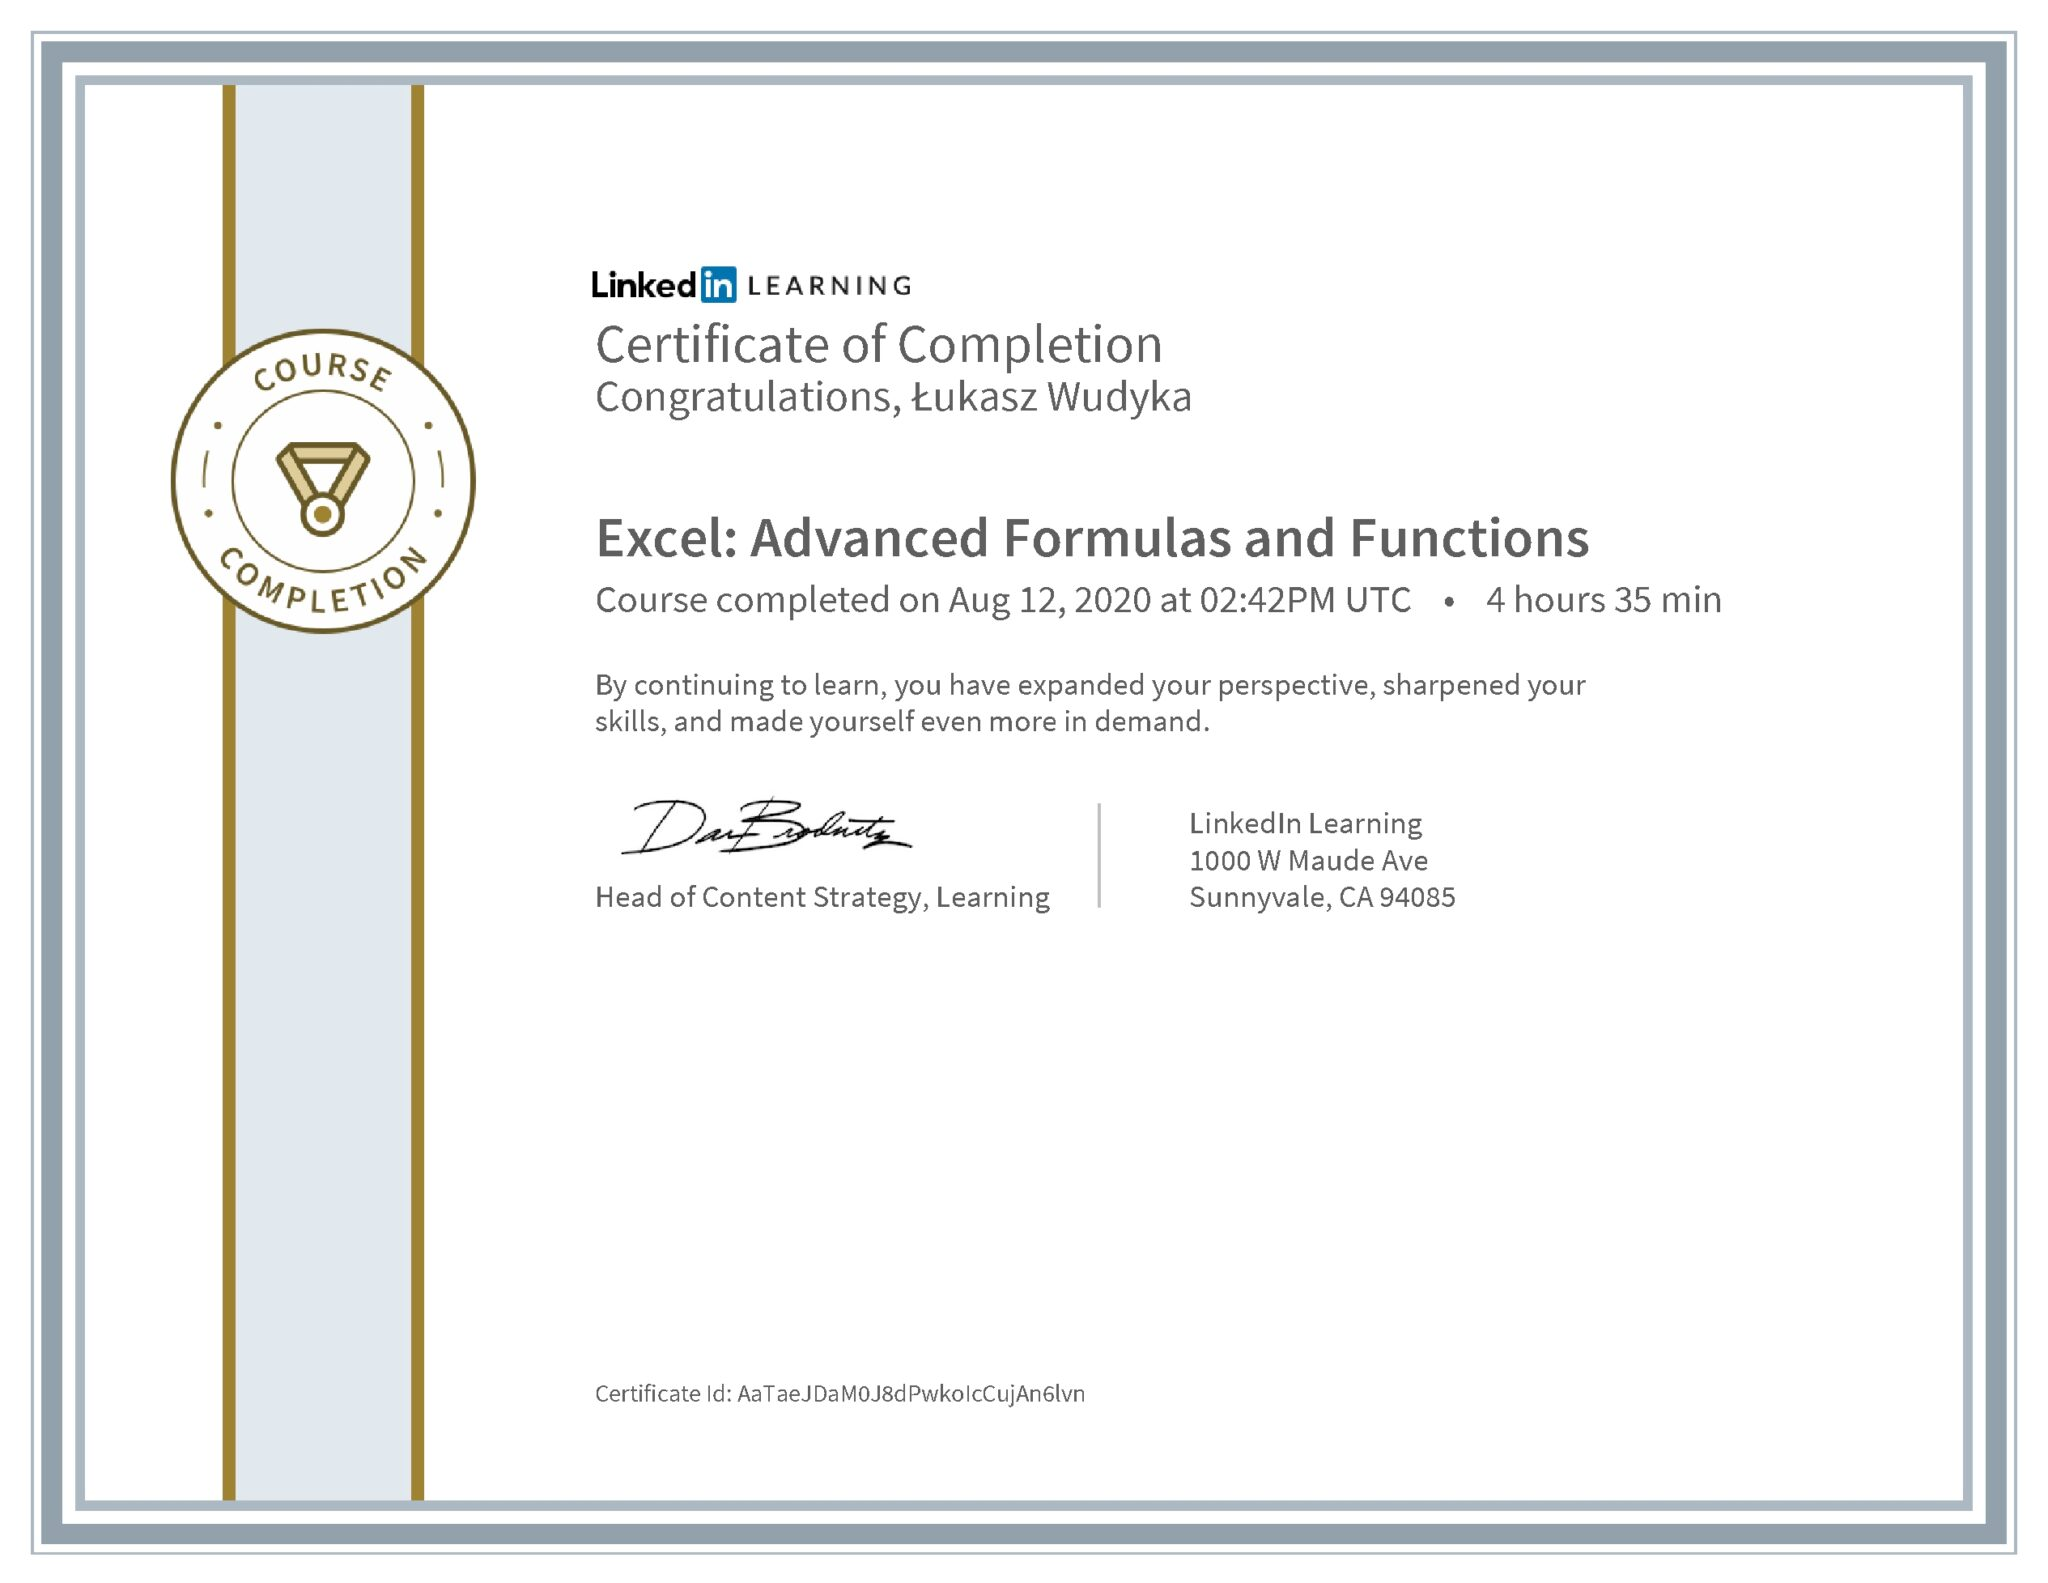 Łukasz Wudyka certyfikat LinkedIn Excel: Advanced Formulas and Functions